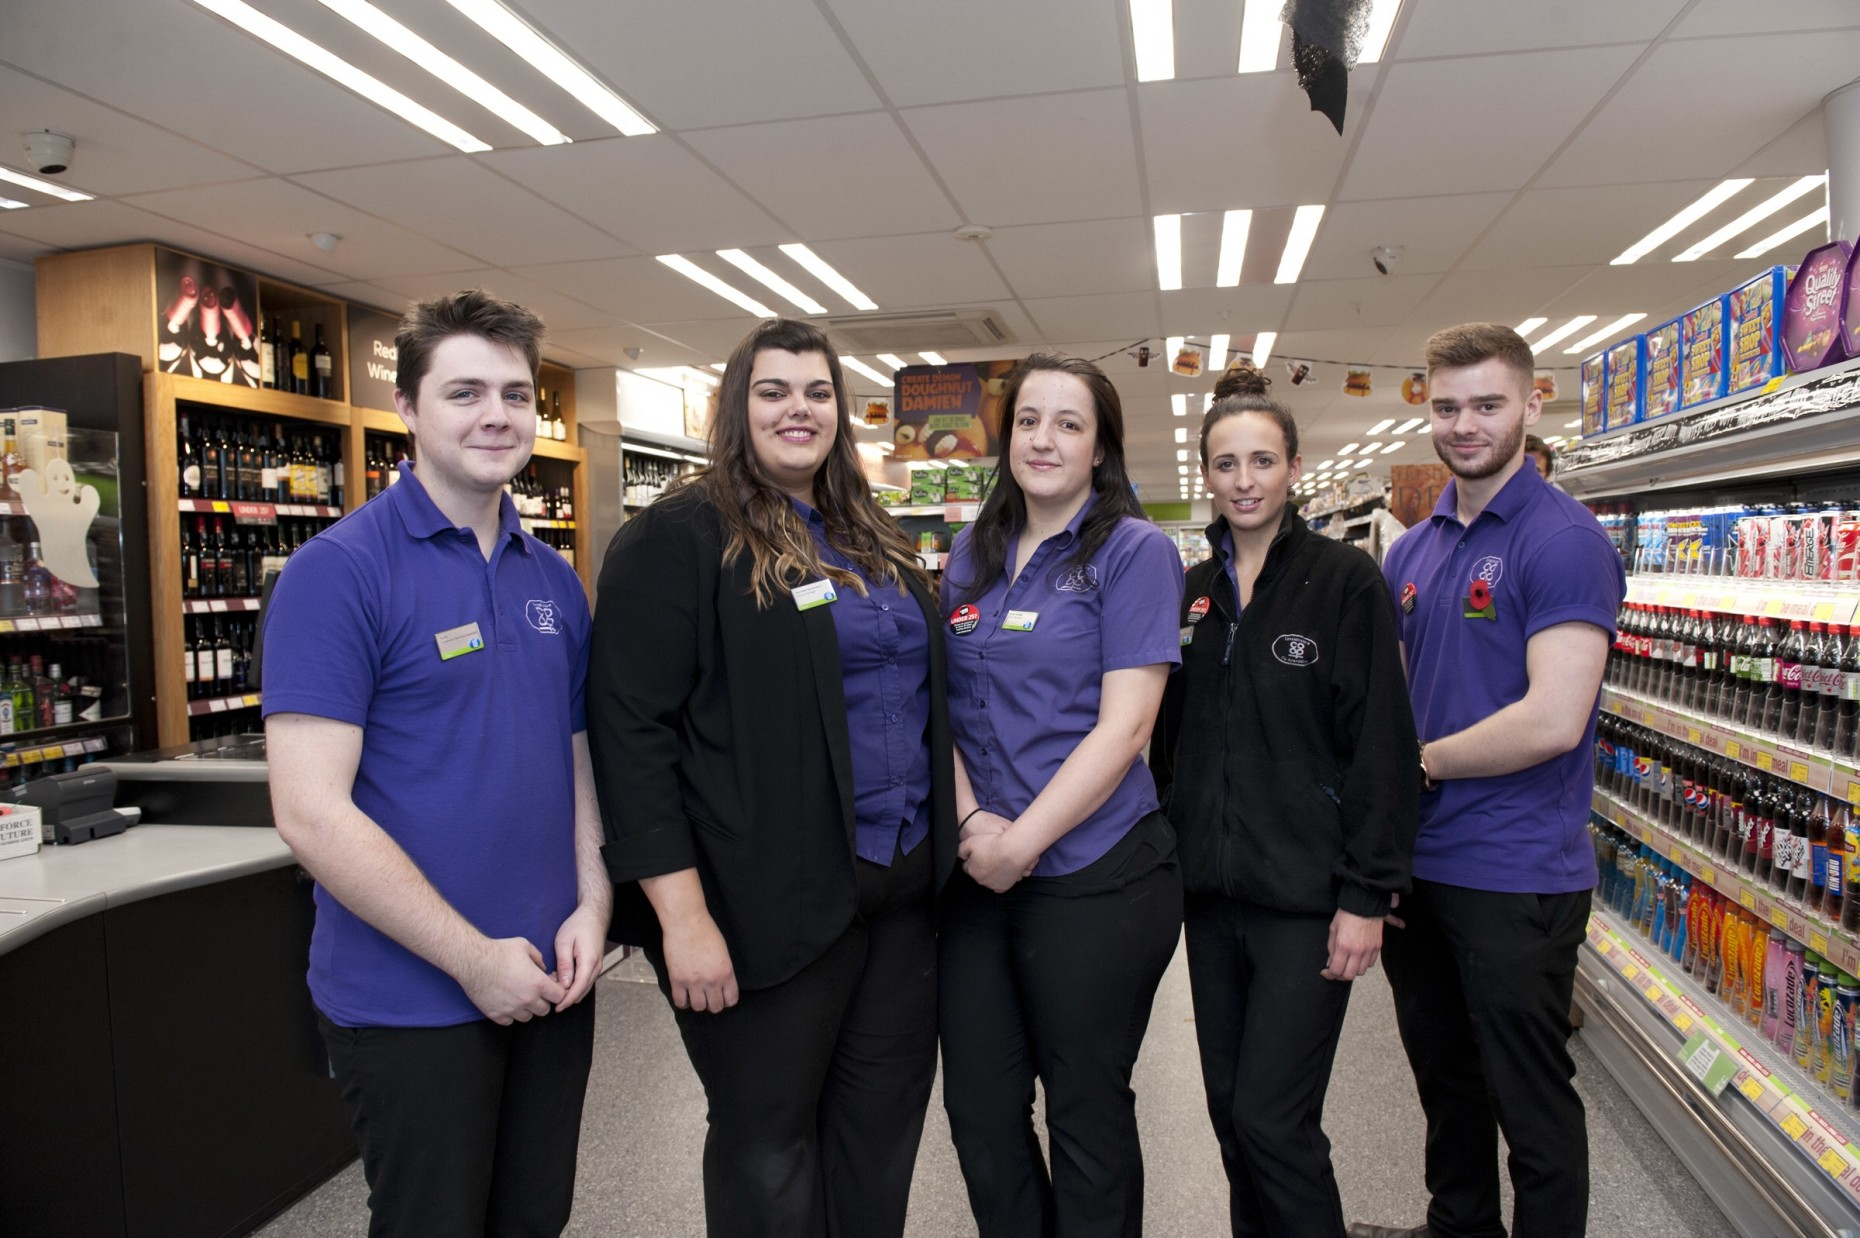 Washingborough Food Store team, from left: Scott Farley, Store Manager Rachelle Richardson, Emily Smejka, Olivia Rattigan and Anthony Beal.